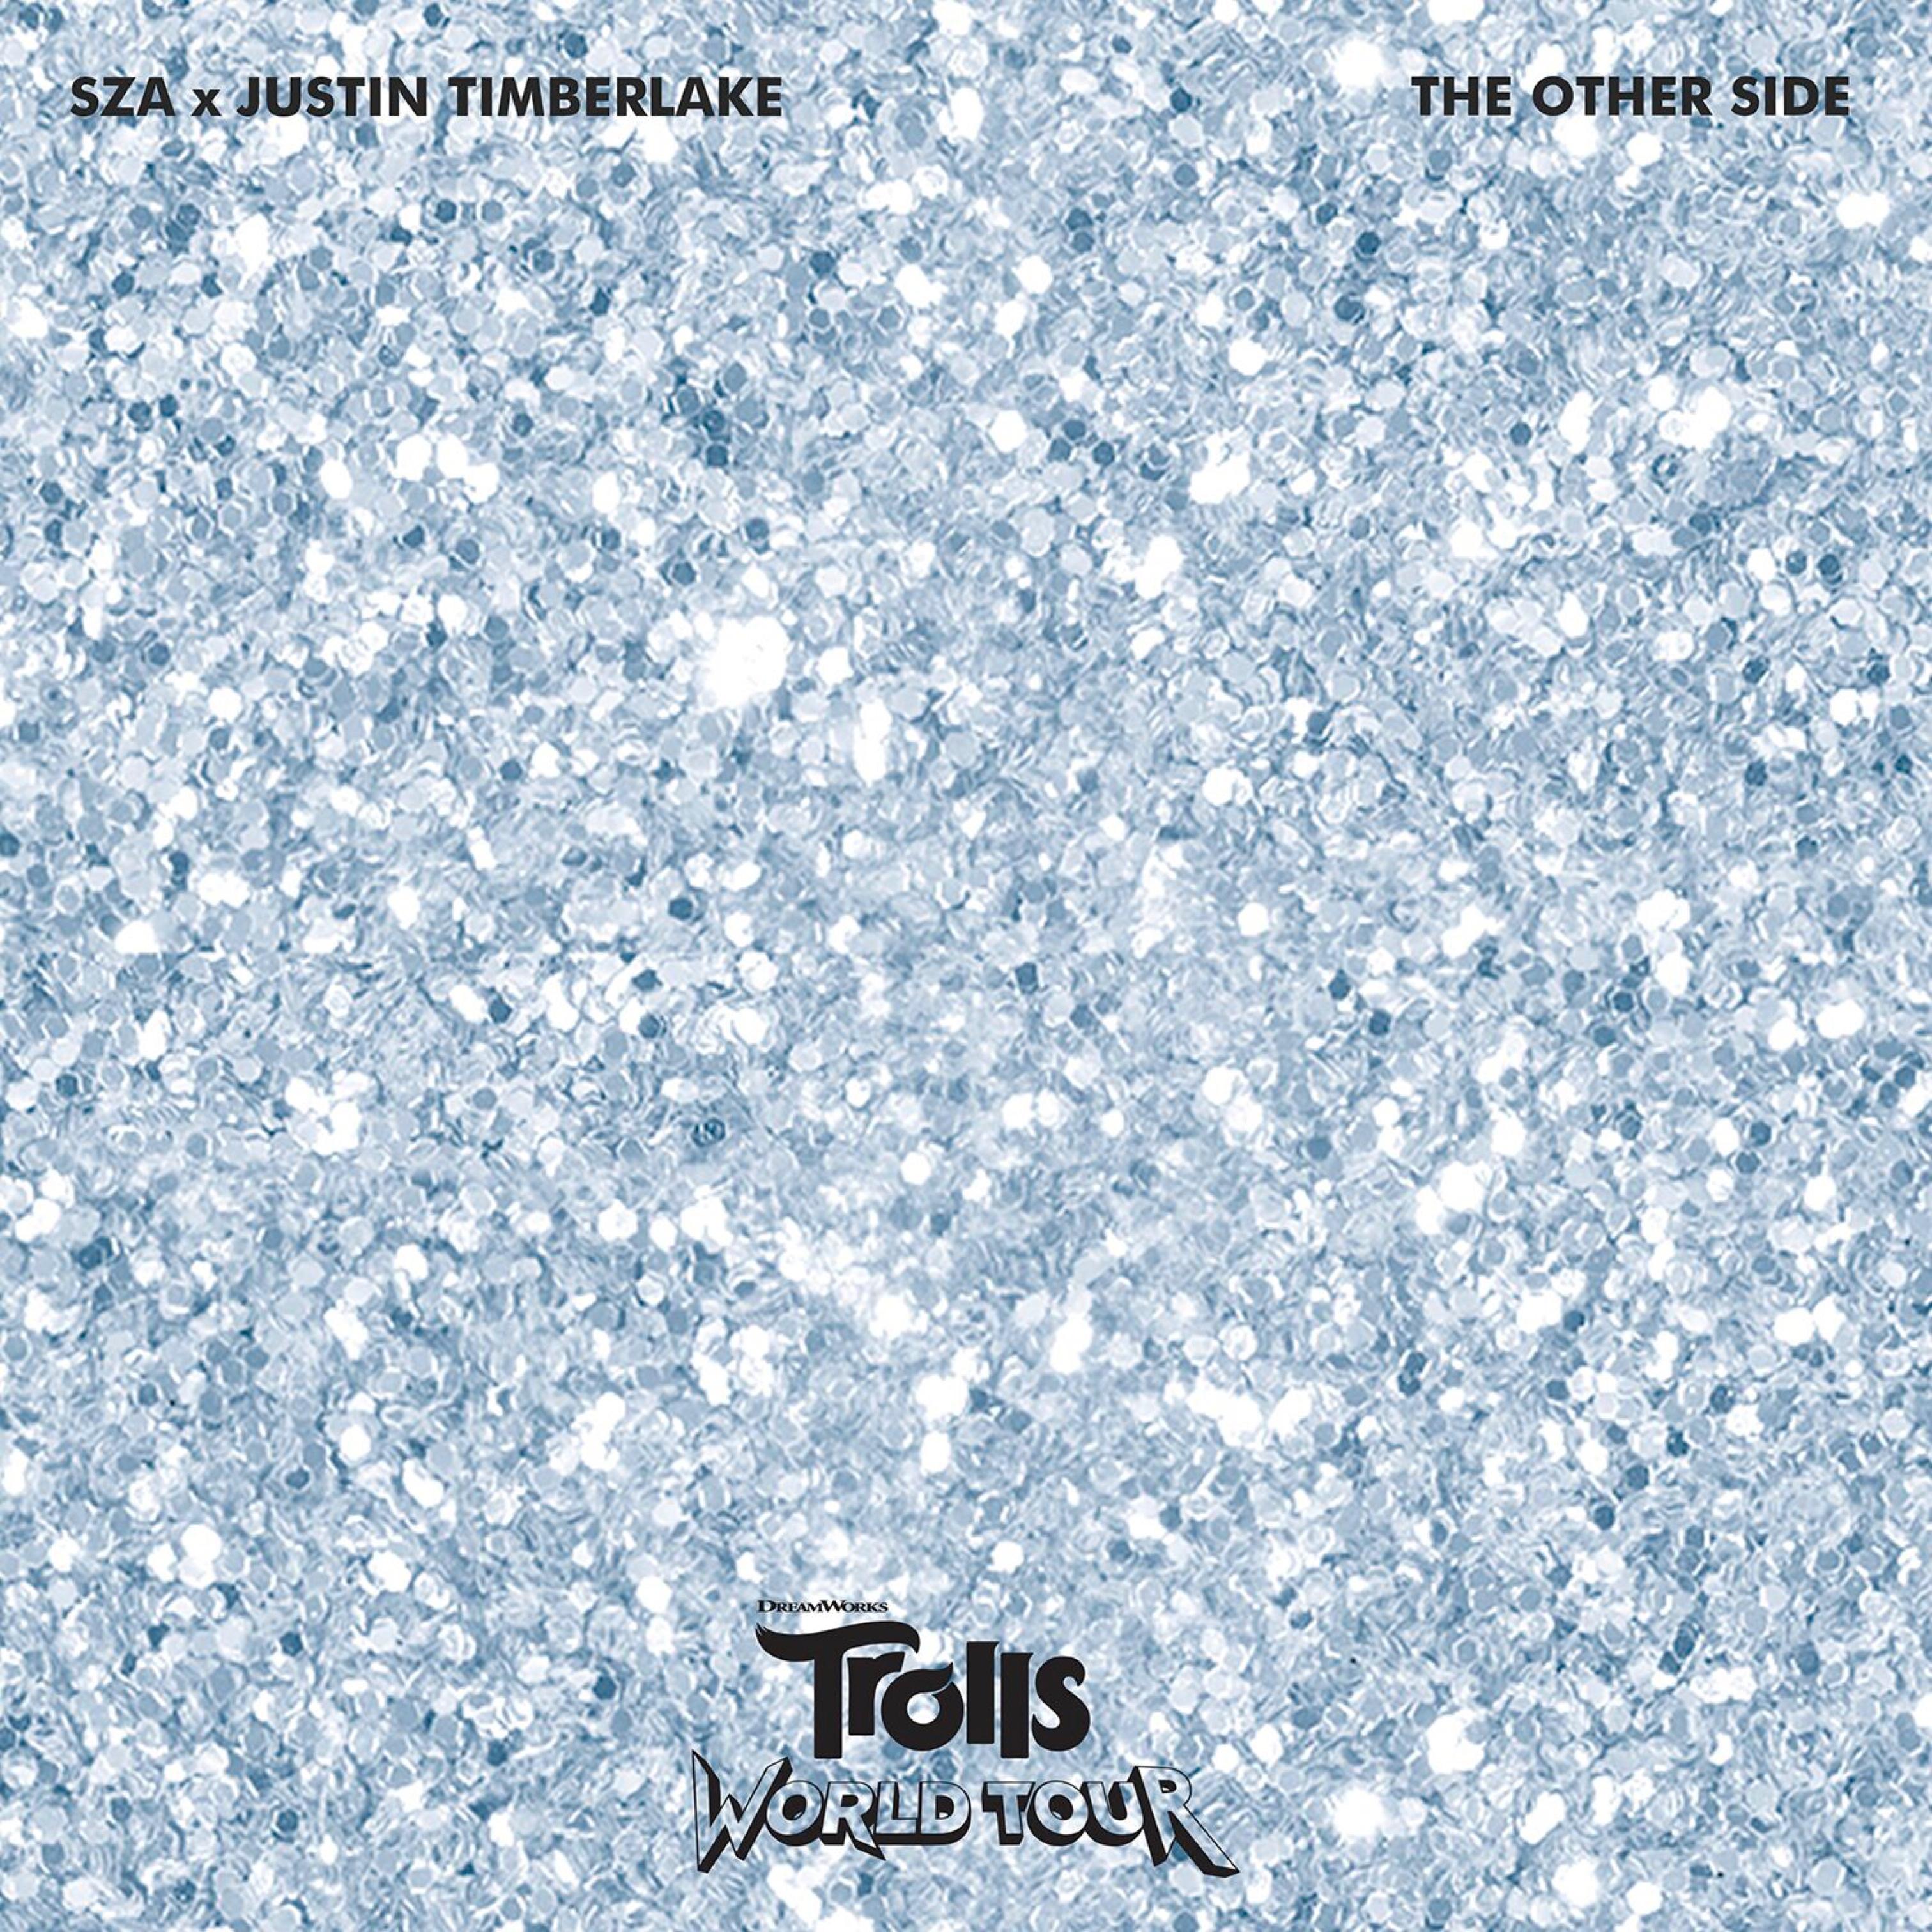 Trolls World Tour, SZA, Justin Timberlake, RCA Records, Vaughn Lowery, 360 Magazine,